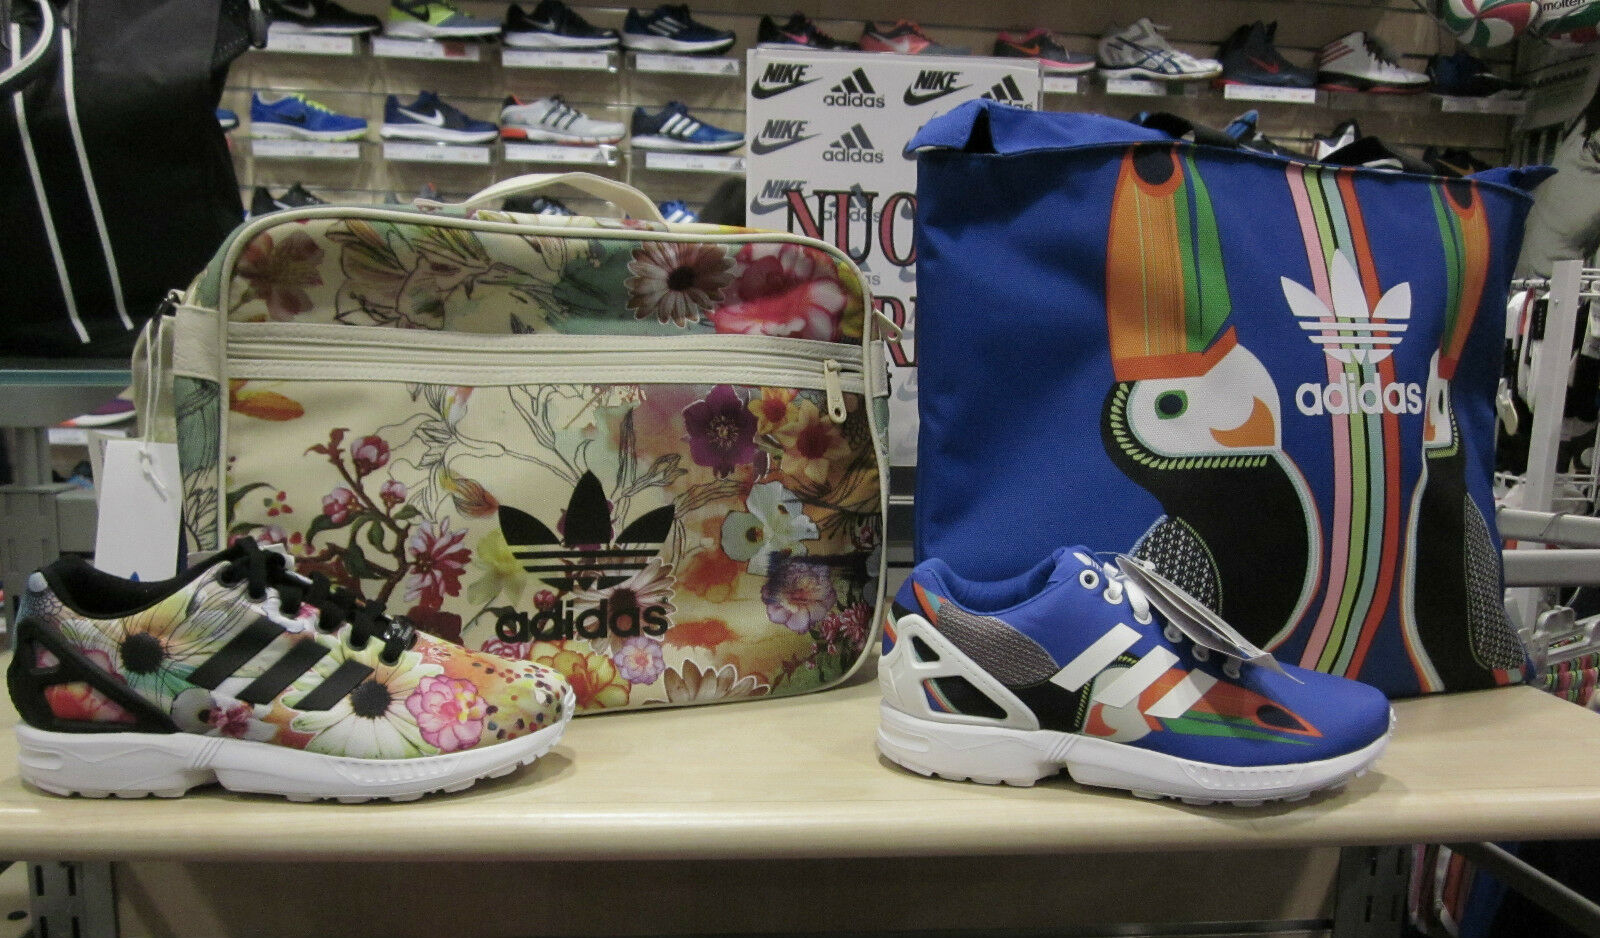 Adidas Donna Set ZX Flux S75697 S78976 + Borsa Blu Bianco